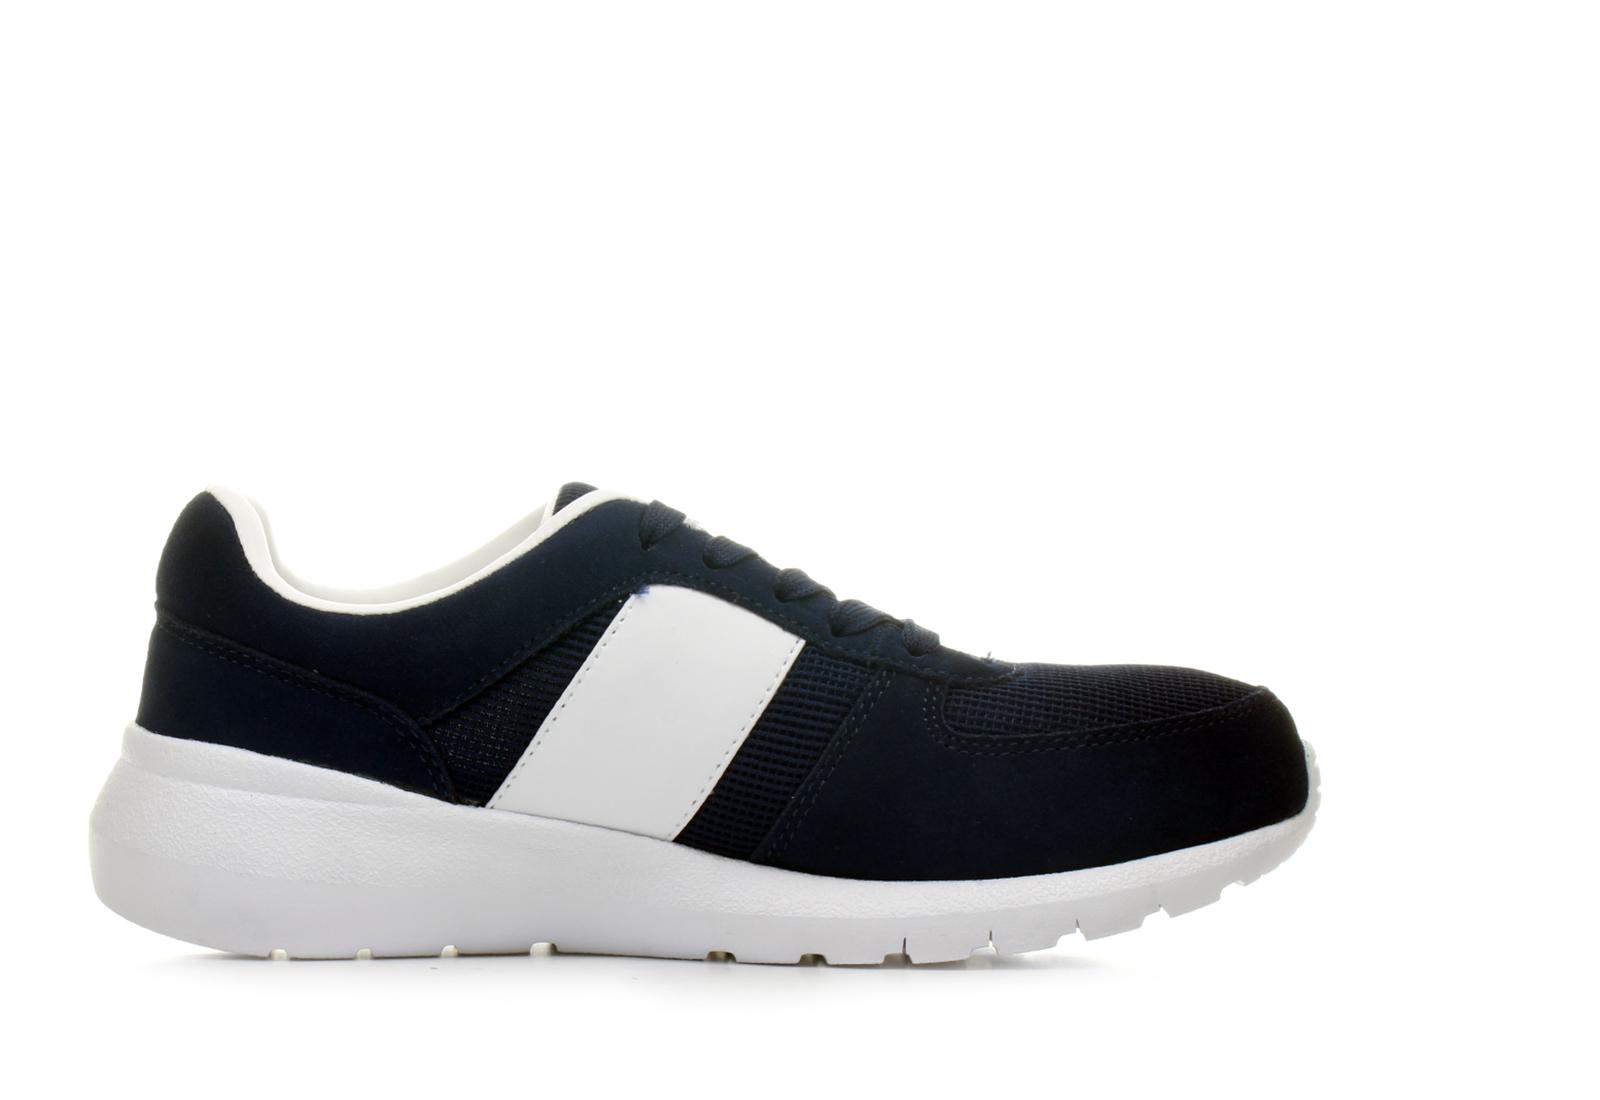 Polo Ralph Lauren Cipő - Cordell - 816641924001 - Office Shoes ... 6597516a12